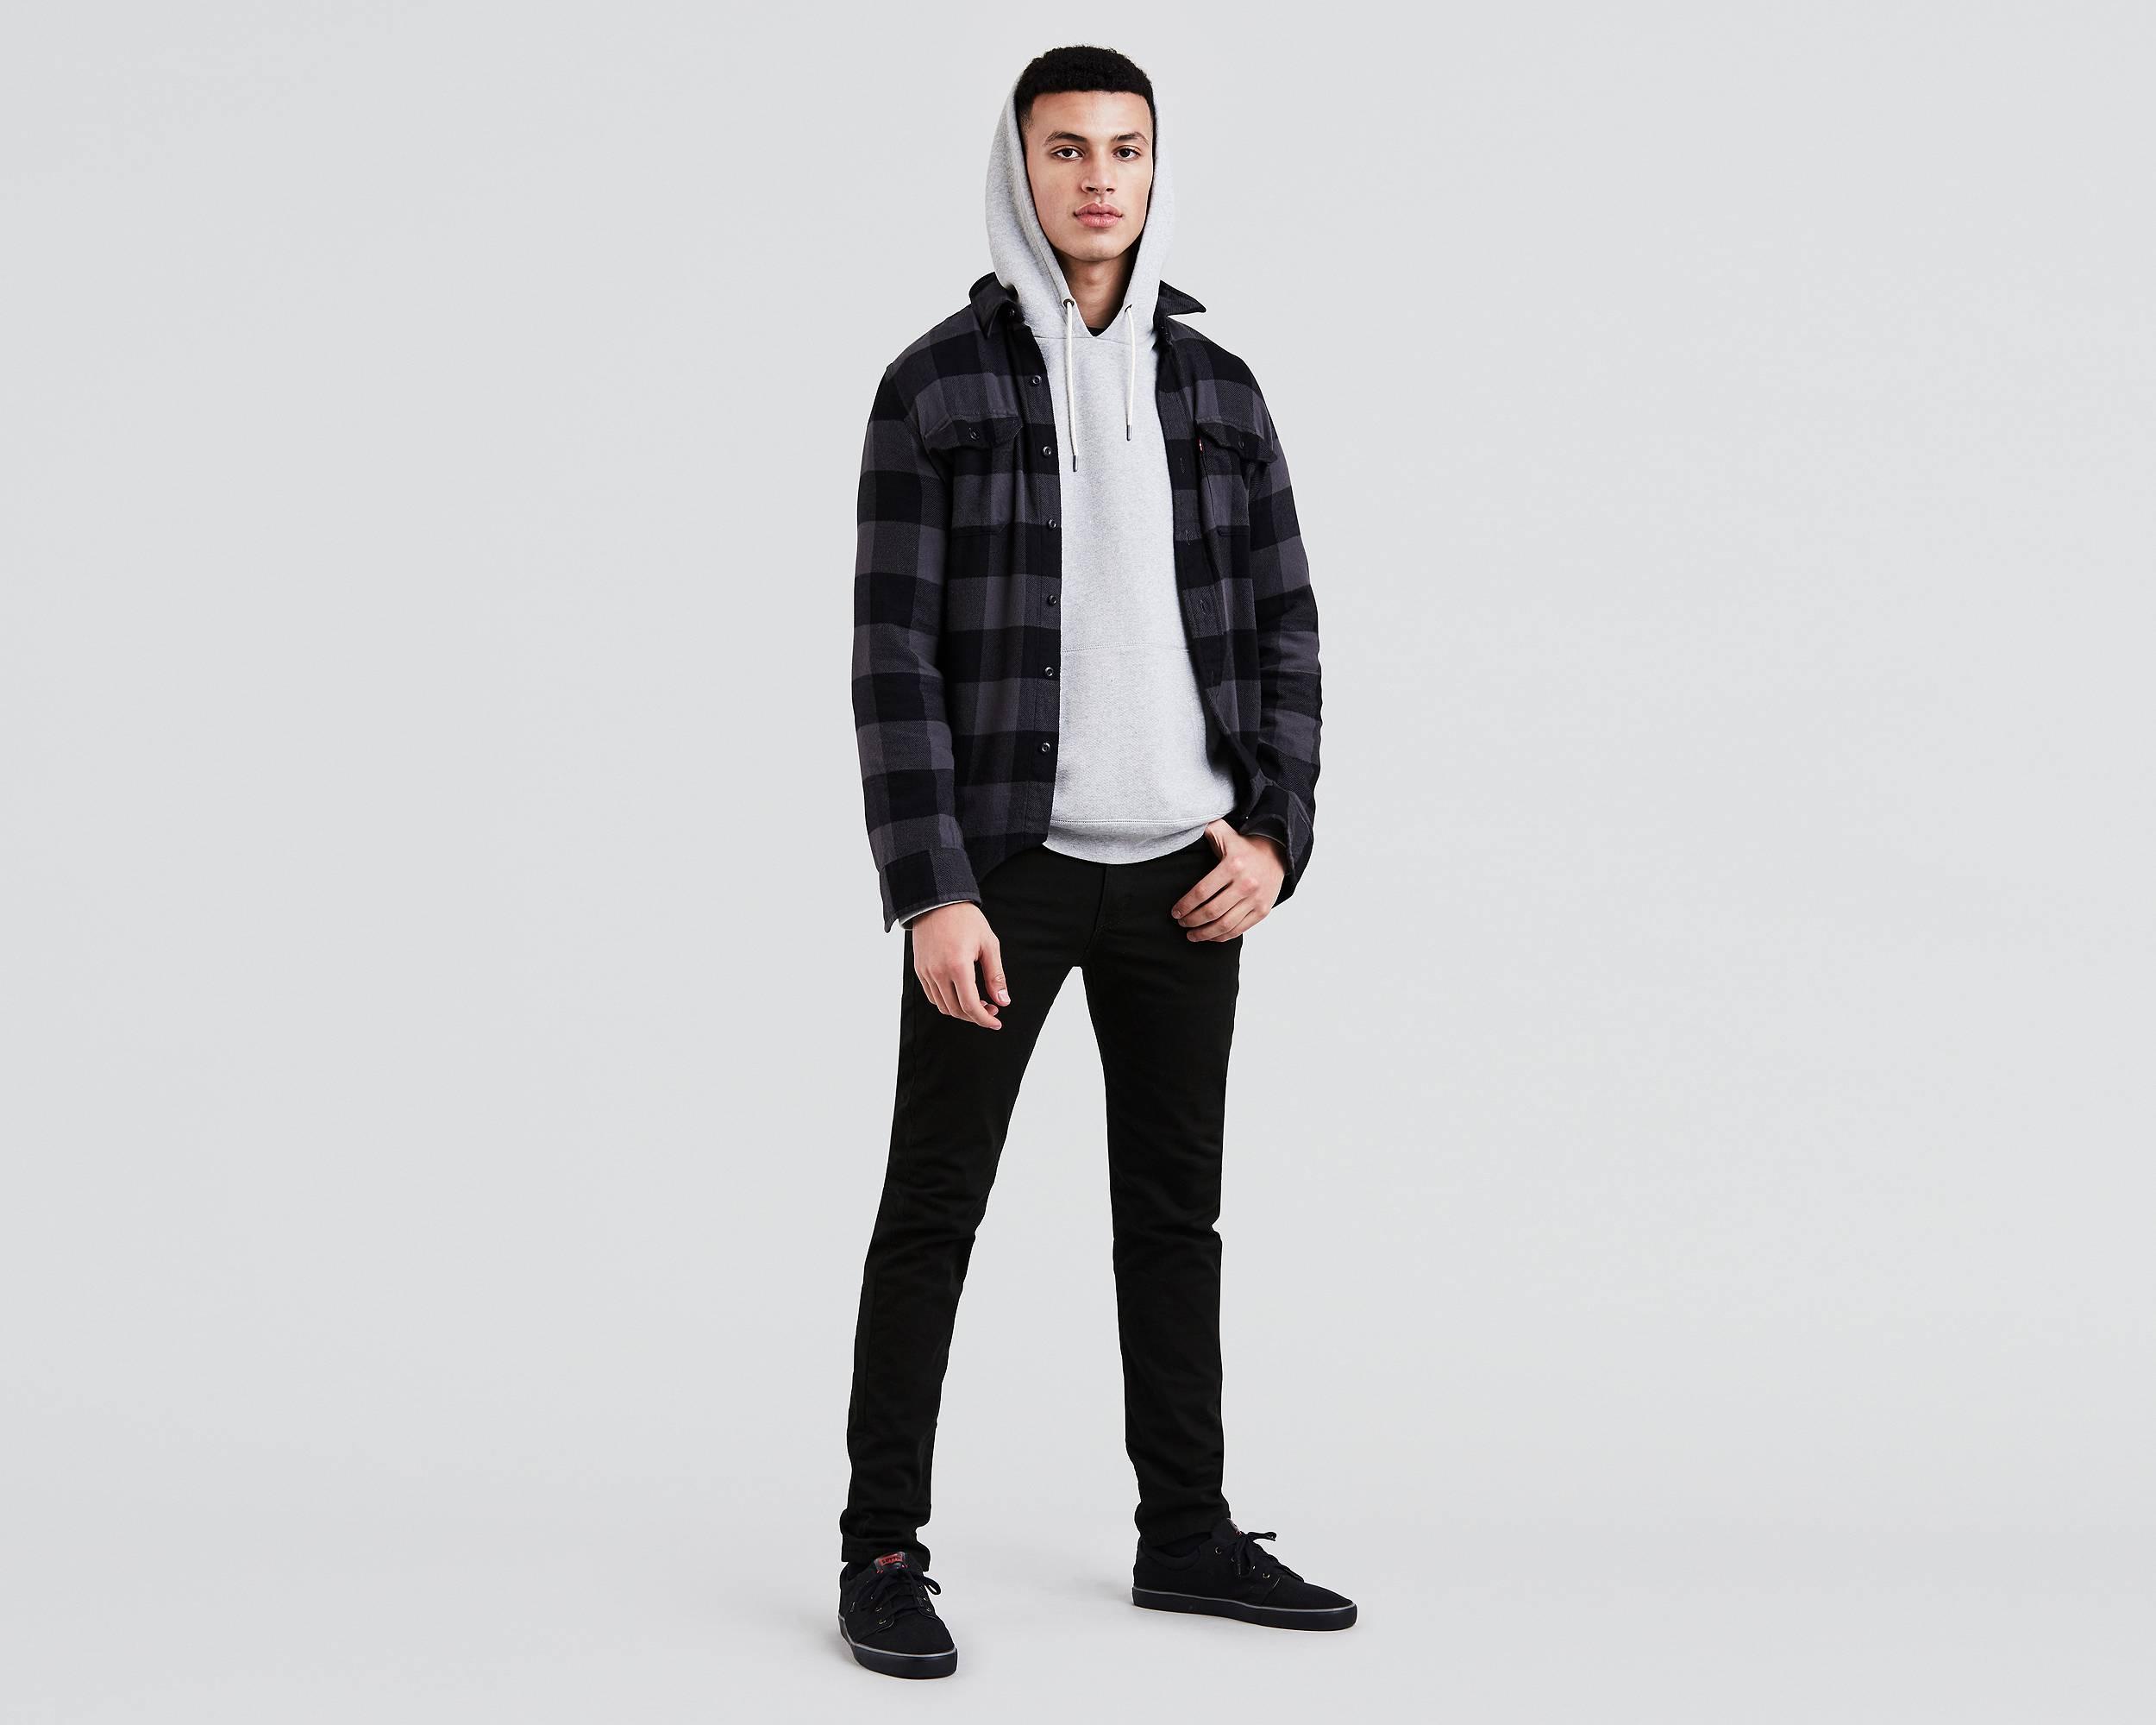 510™ Skinny Fit Stretch Jeans | Jet |Levi's® United States ...